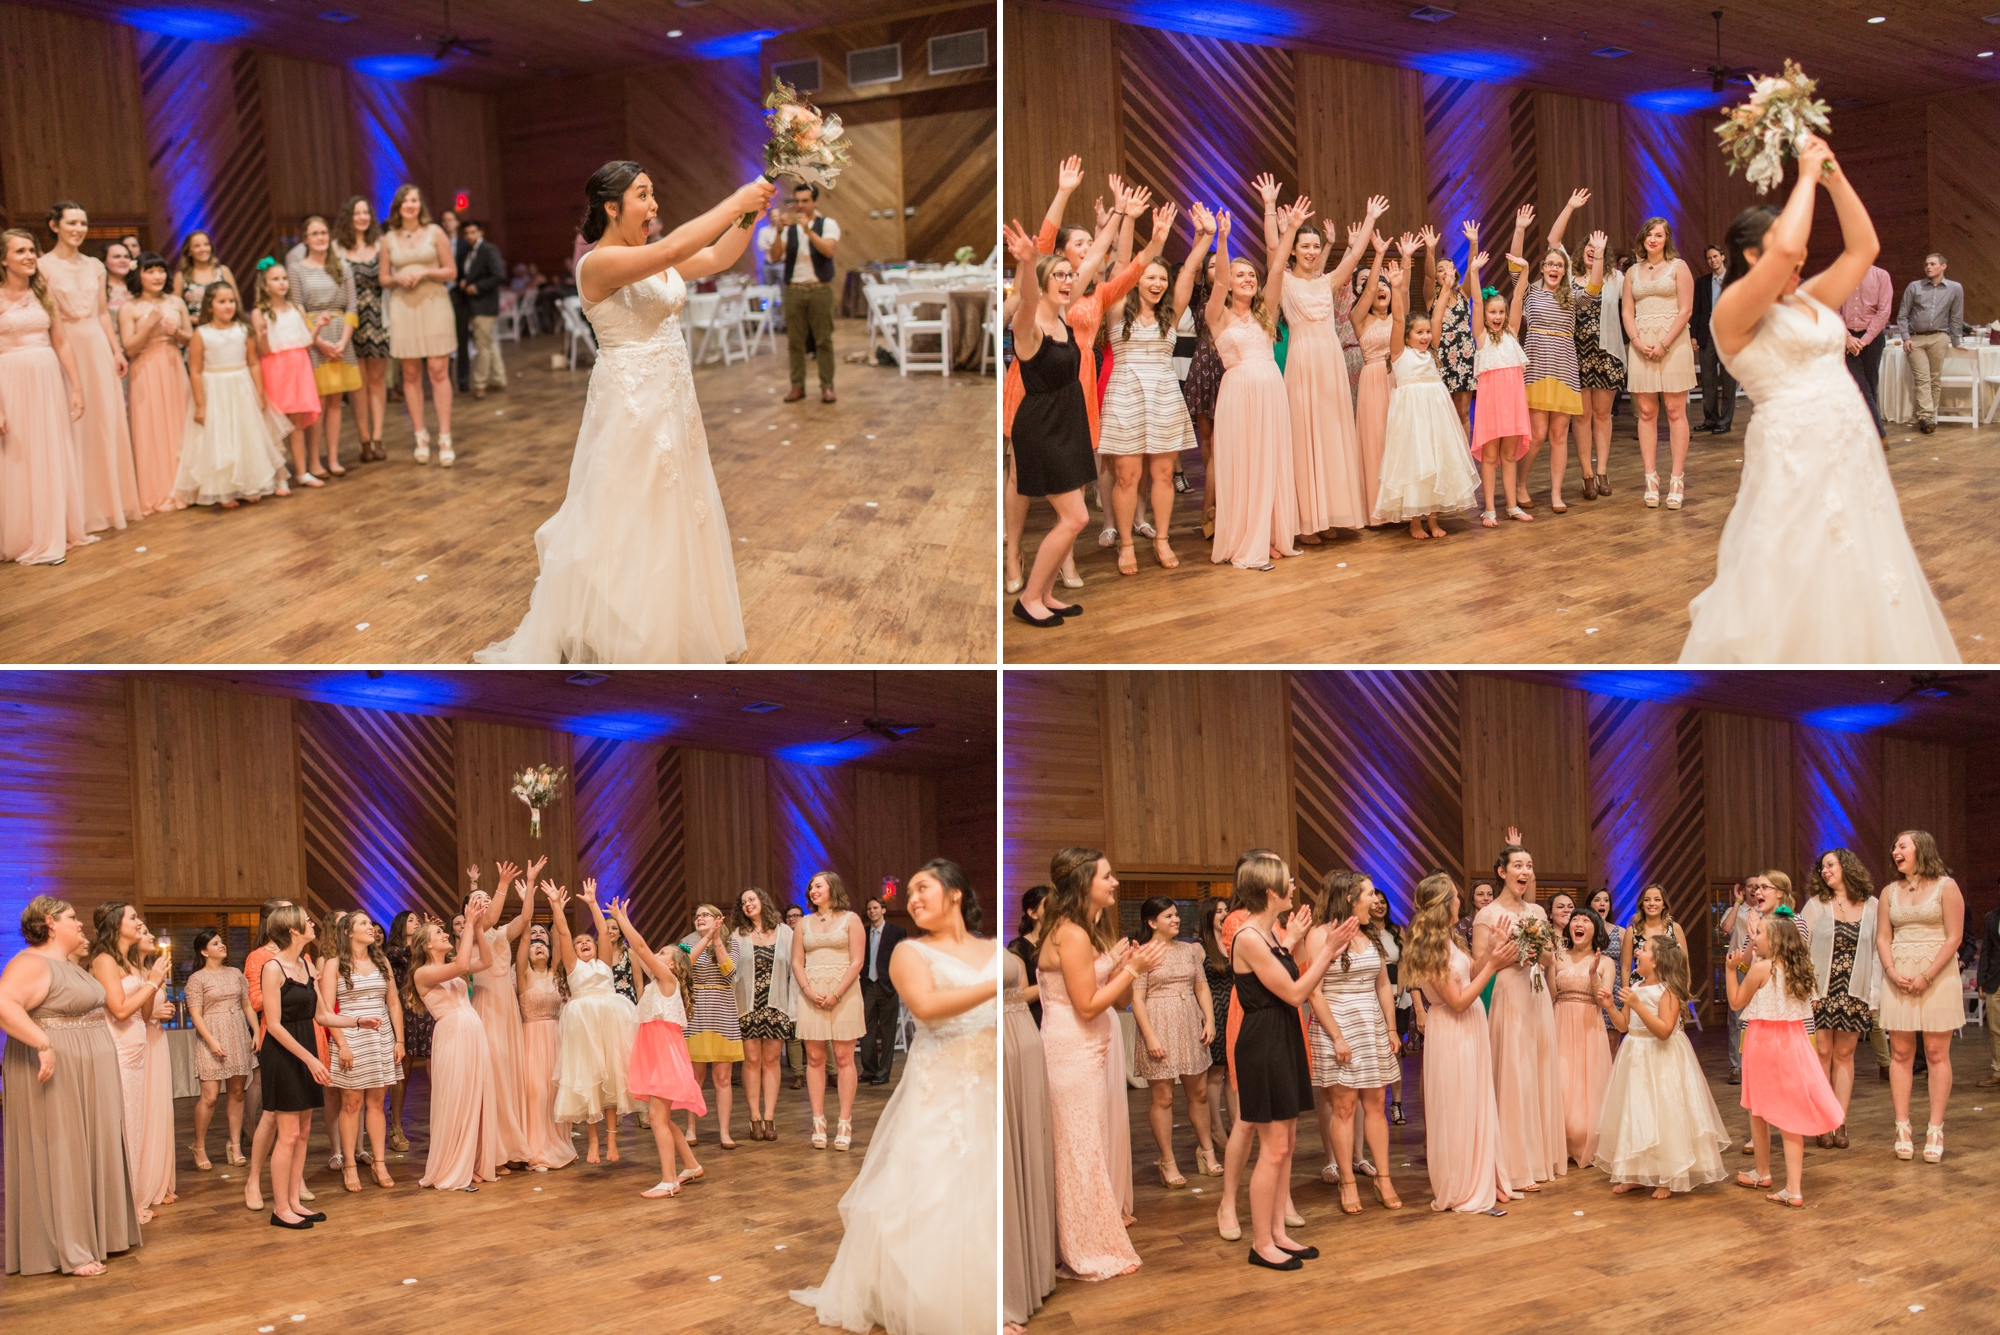 giles wedding blog 48.jpg